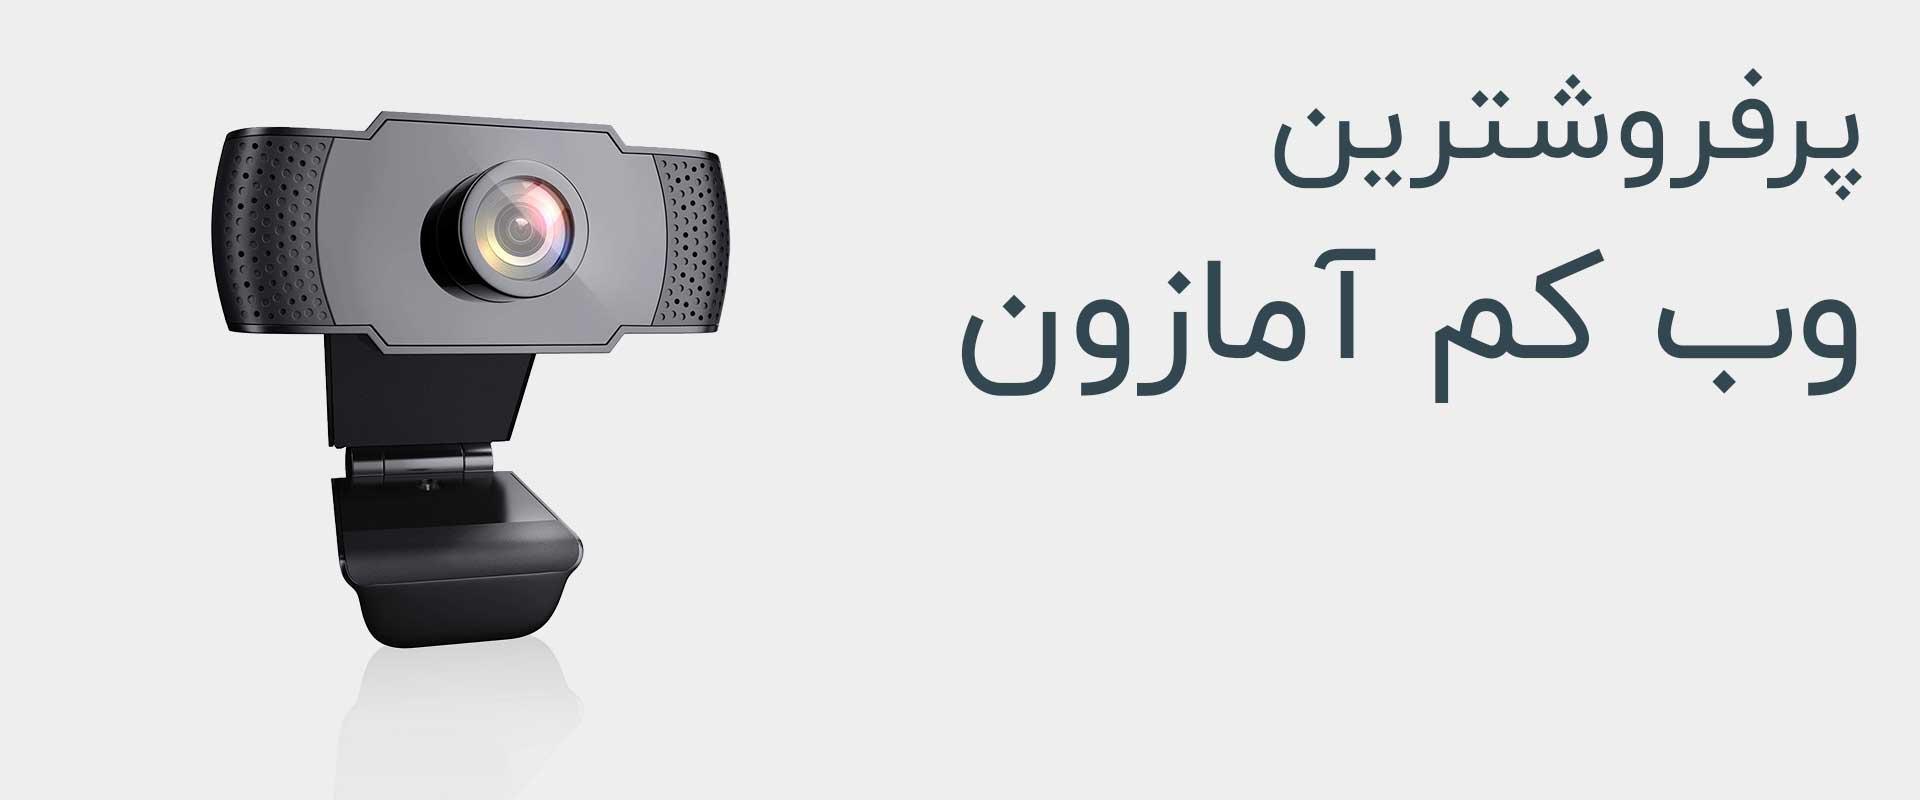 Android Box Dot Ir Banners Wansview Best Amazon Seller Webcam 9911 Light